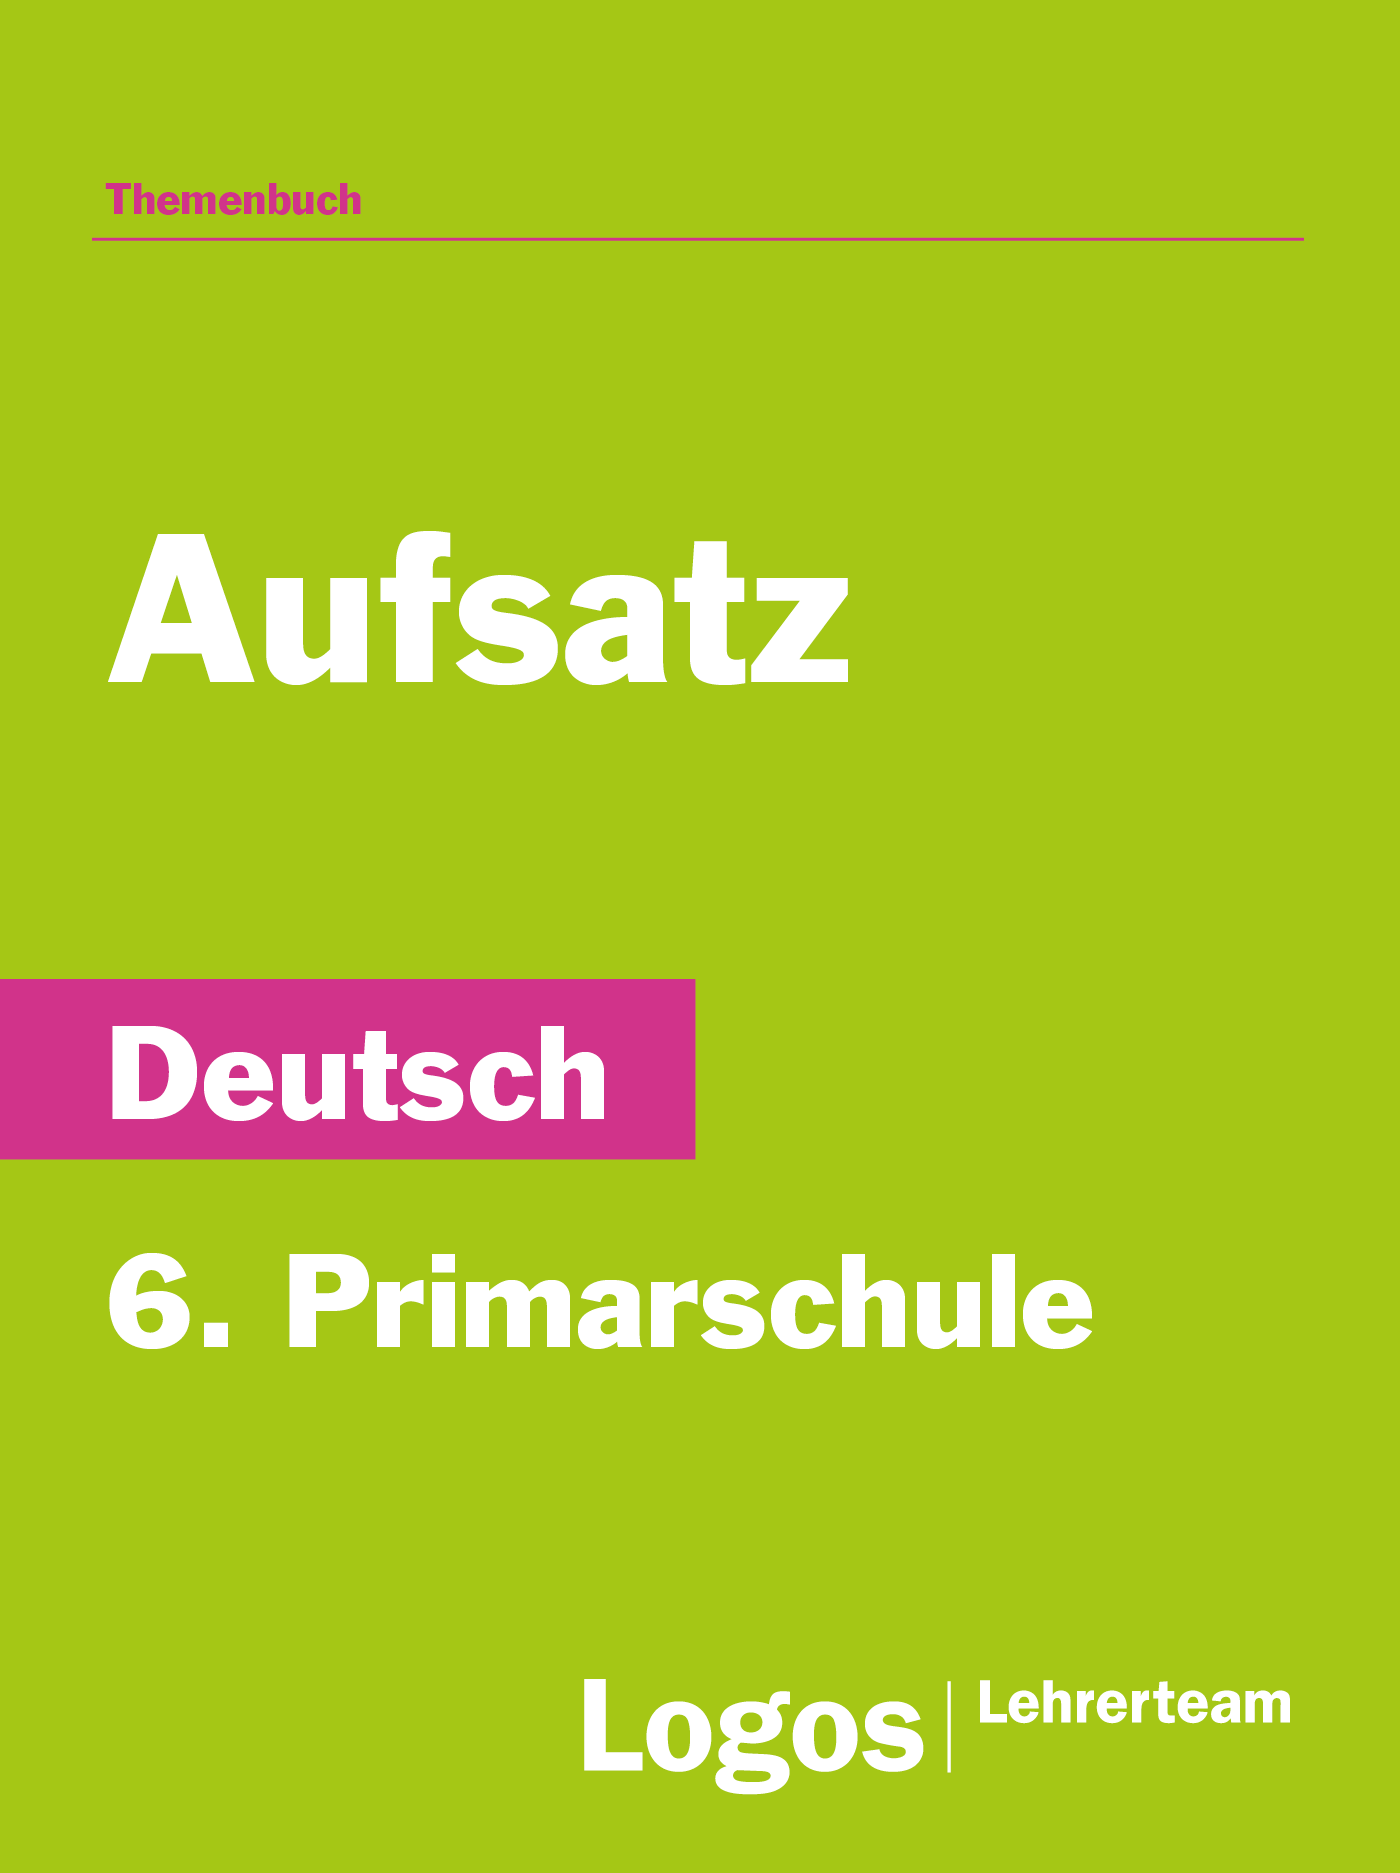 Aufsatz - 6. Primarschule